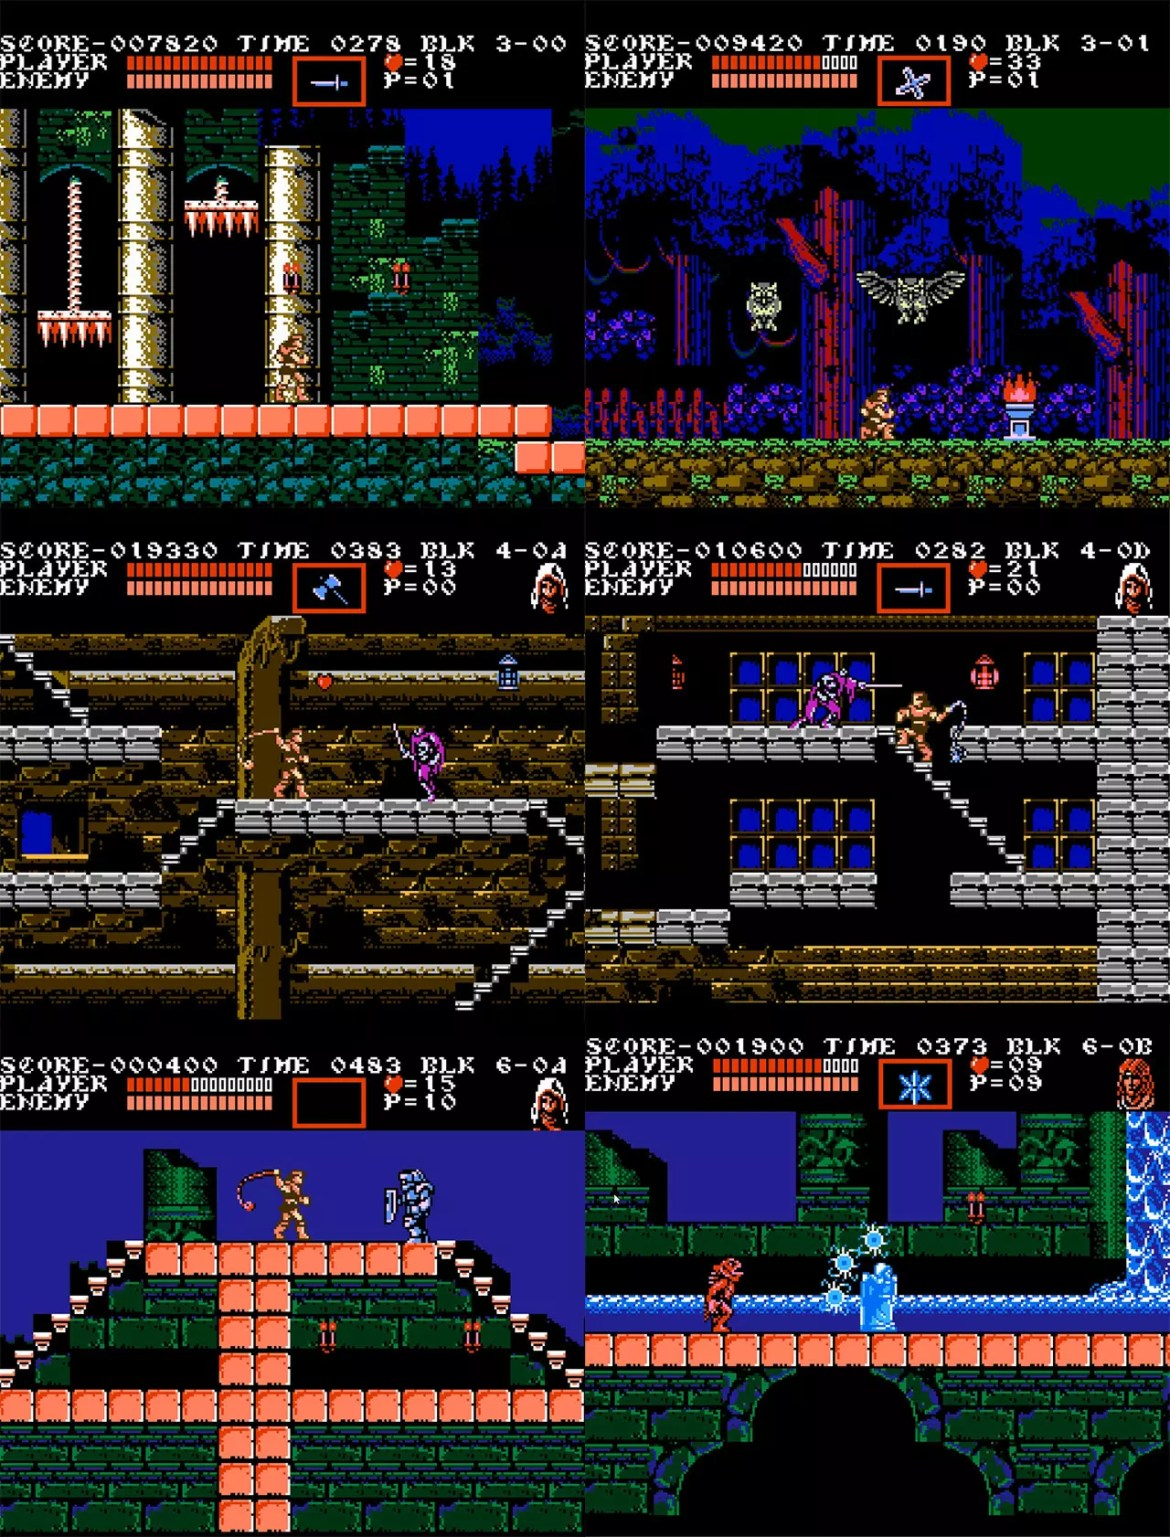 Castlevania III: Dracula's Curse Screenshots.